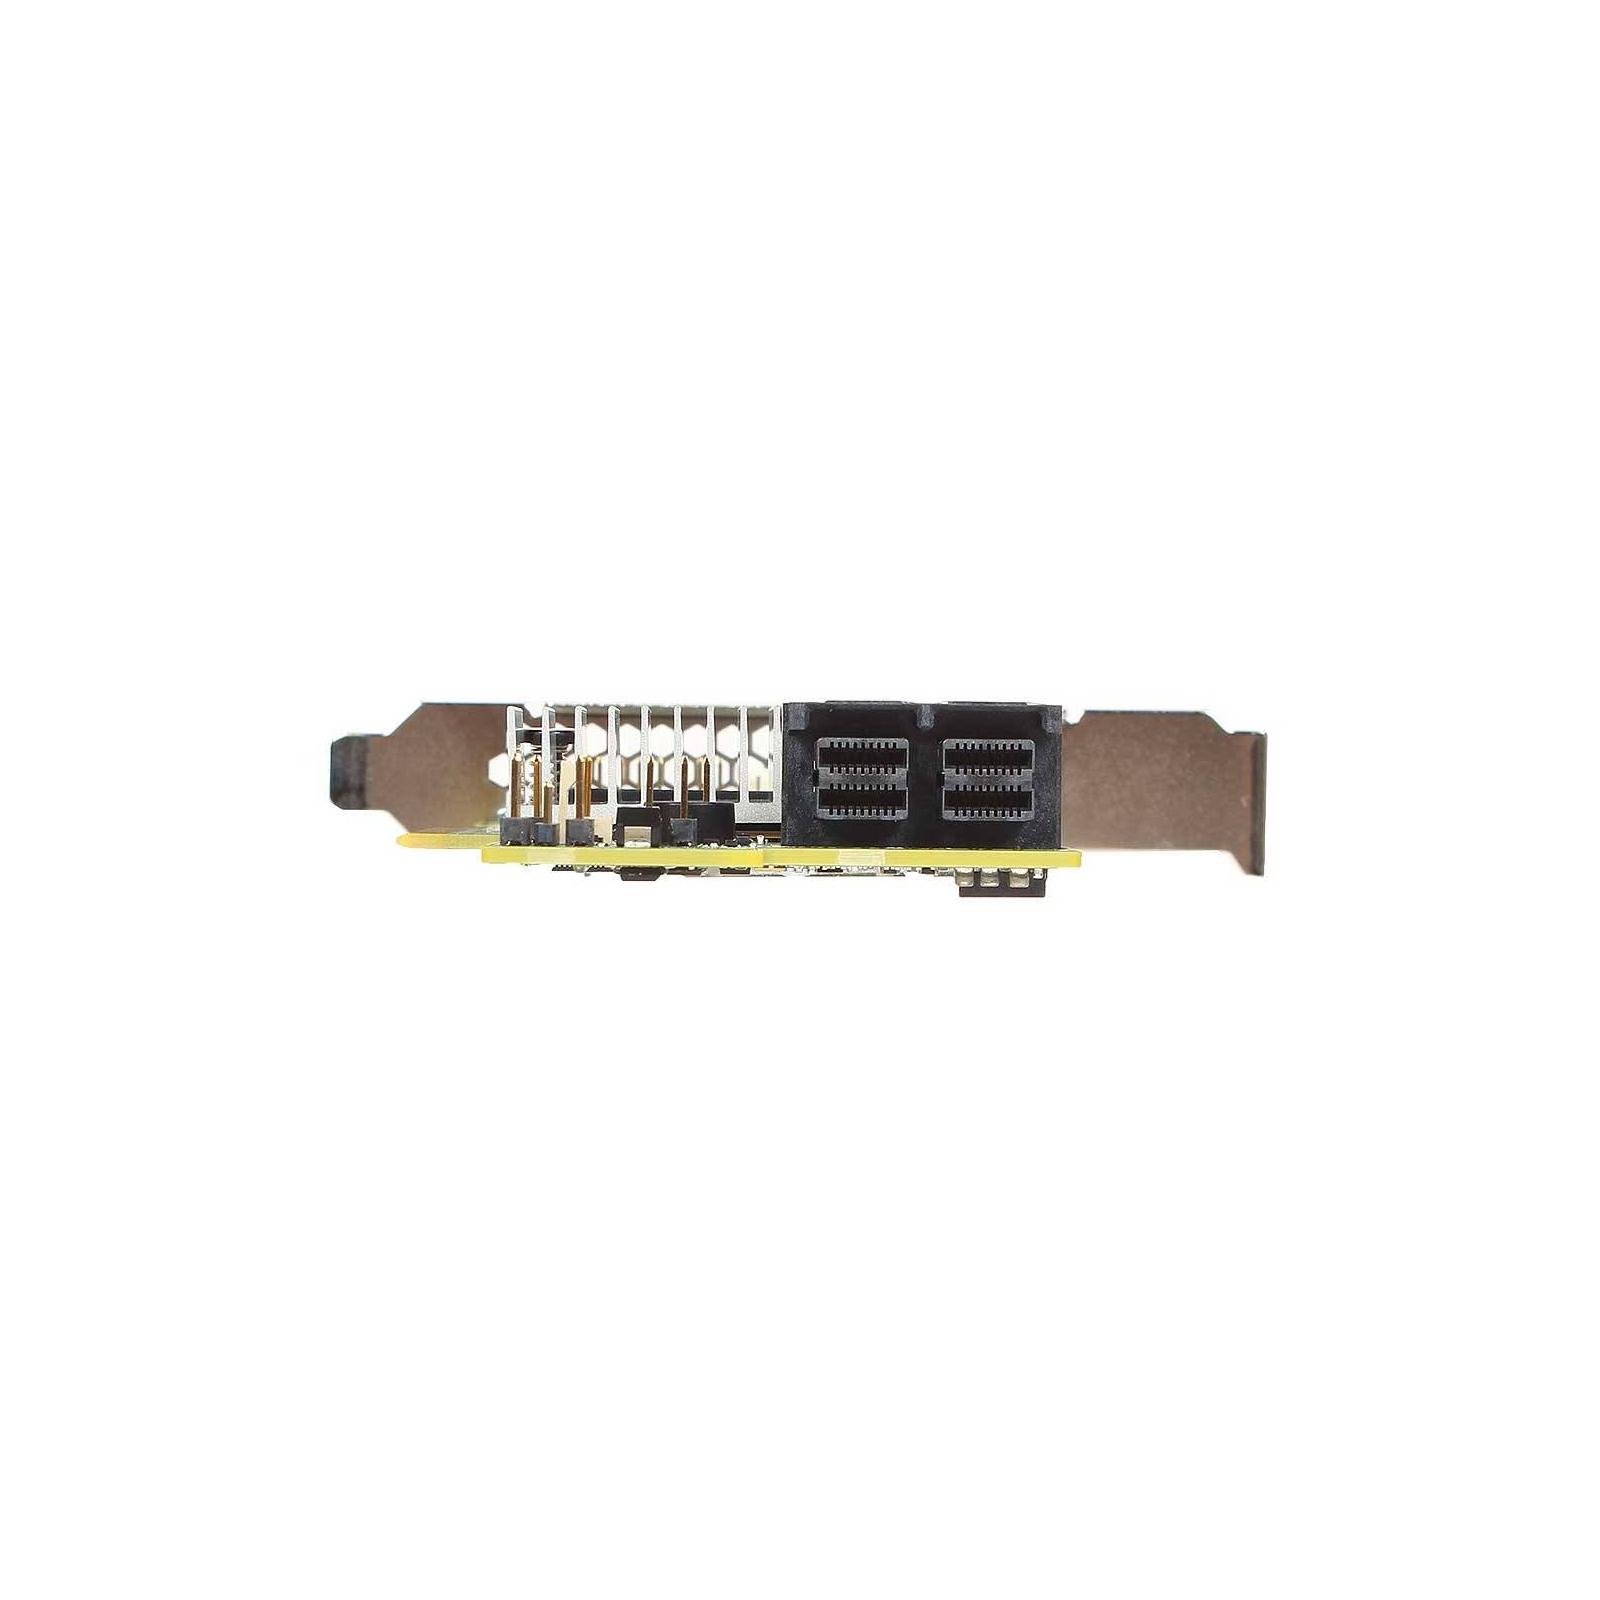 Контроллер RAID LSI MegaRAID SAS 9361-8i (1GB) (05-25420-08) изображение 4